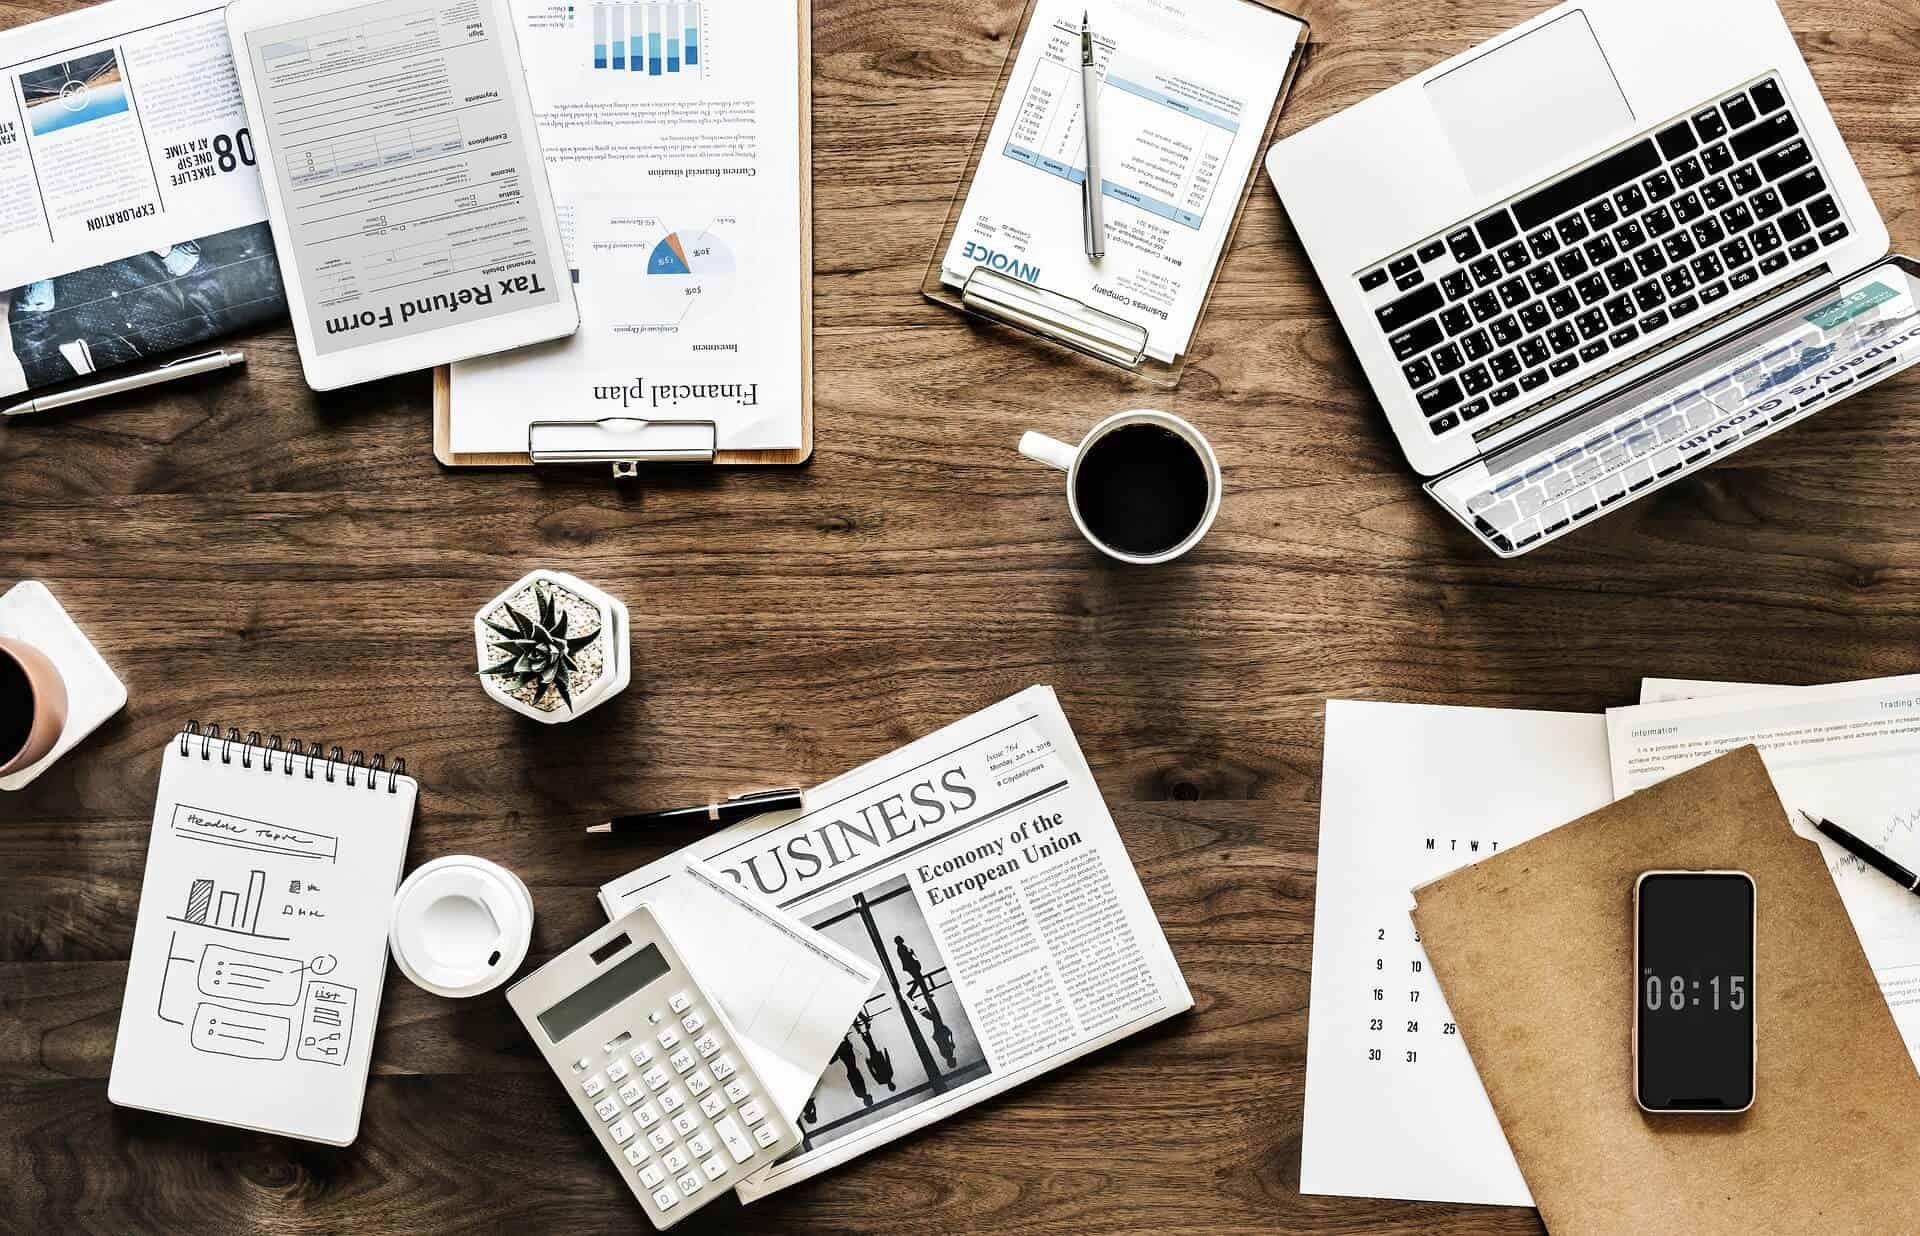 valores para ser emprendedor